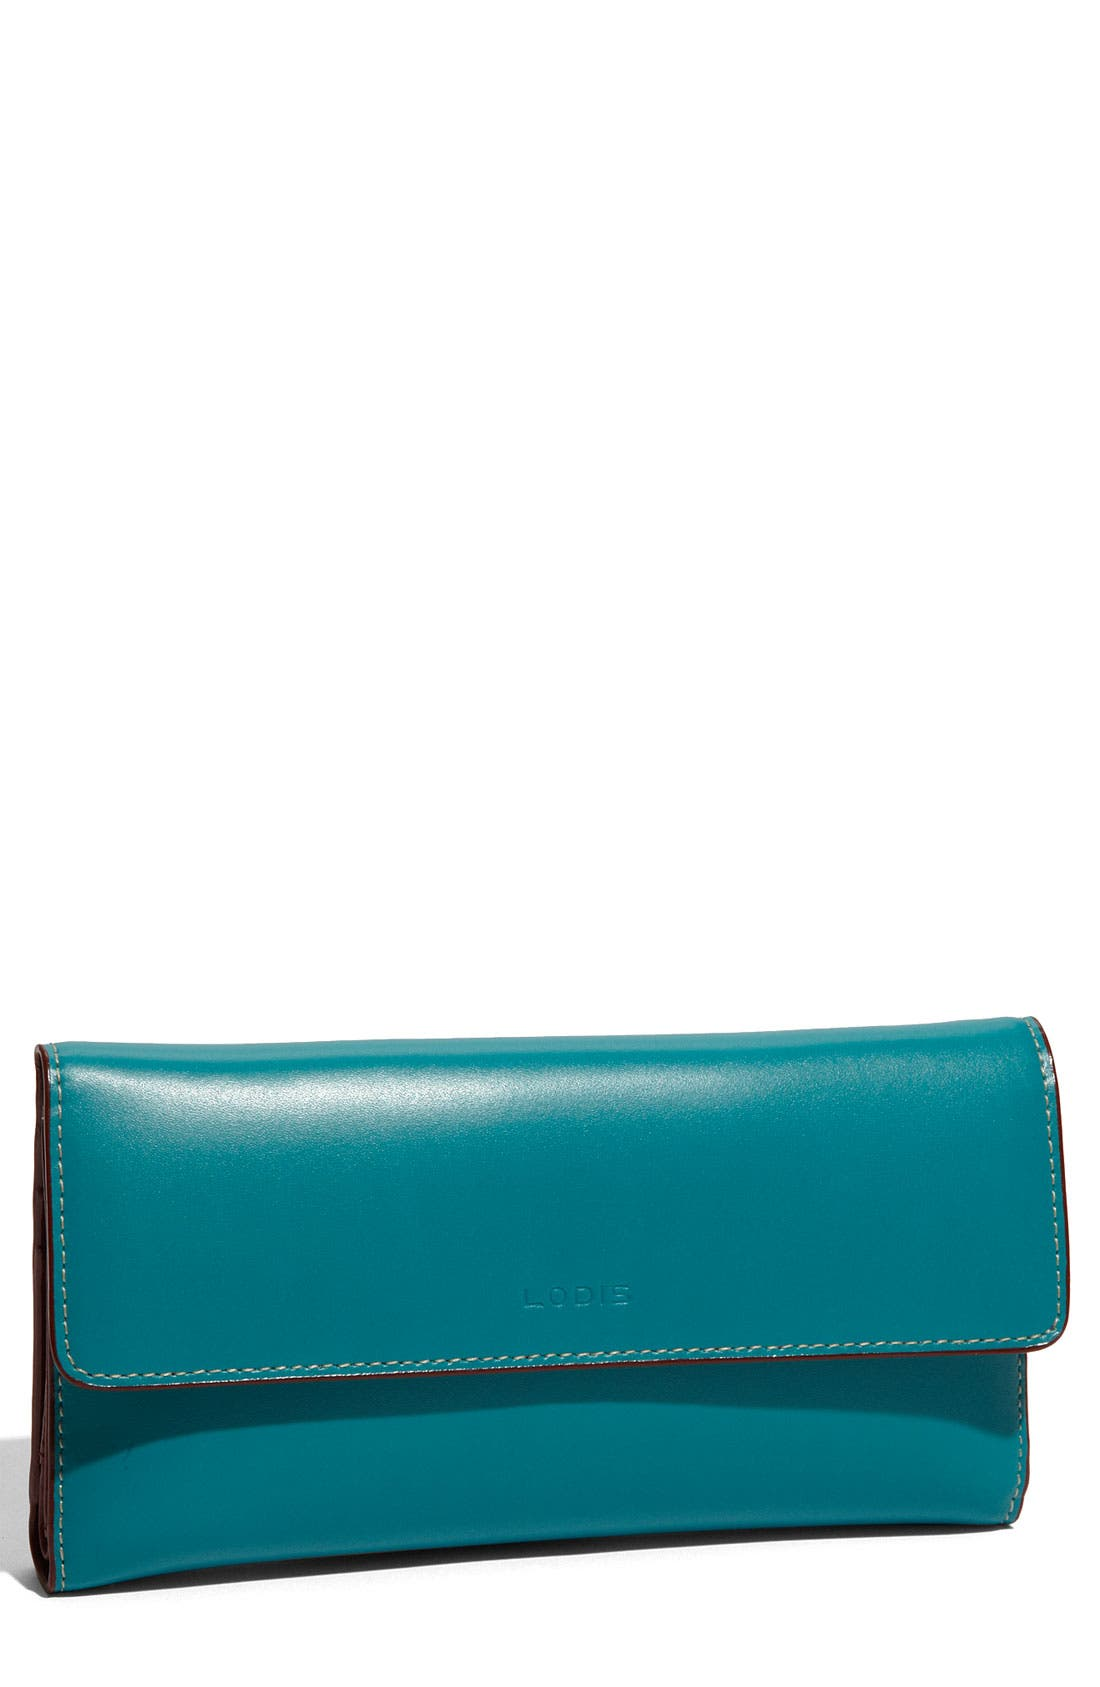 Lodis 'Audrey' Checkbook Clutch Wallet,                             Main thumbnail 1, color,                             Teal/ Merlot